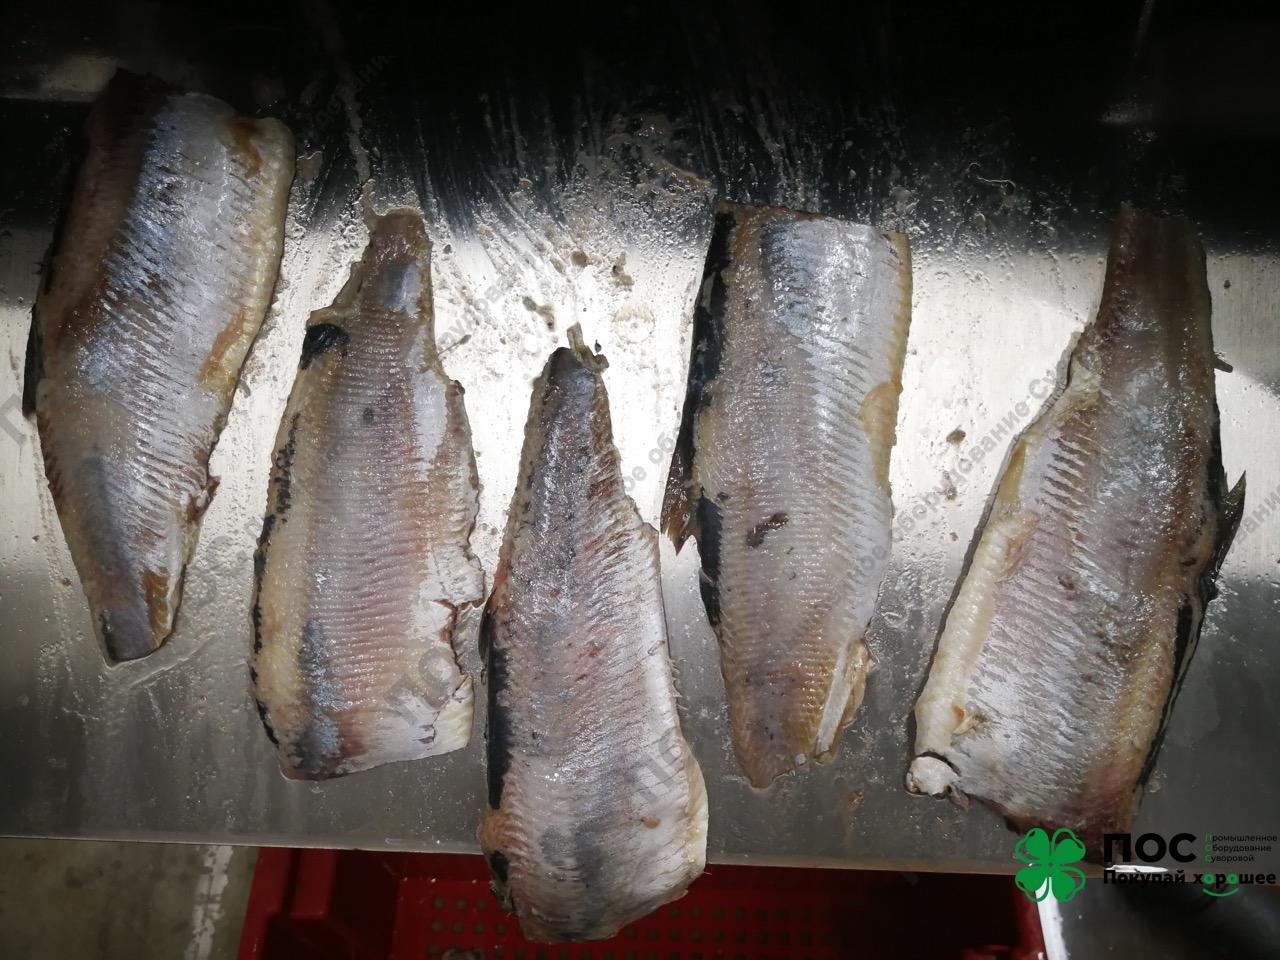 31.01.20 / Запущена автоматическая шкуросъемная машина для рыбы.